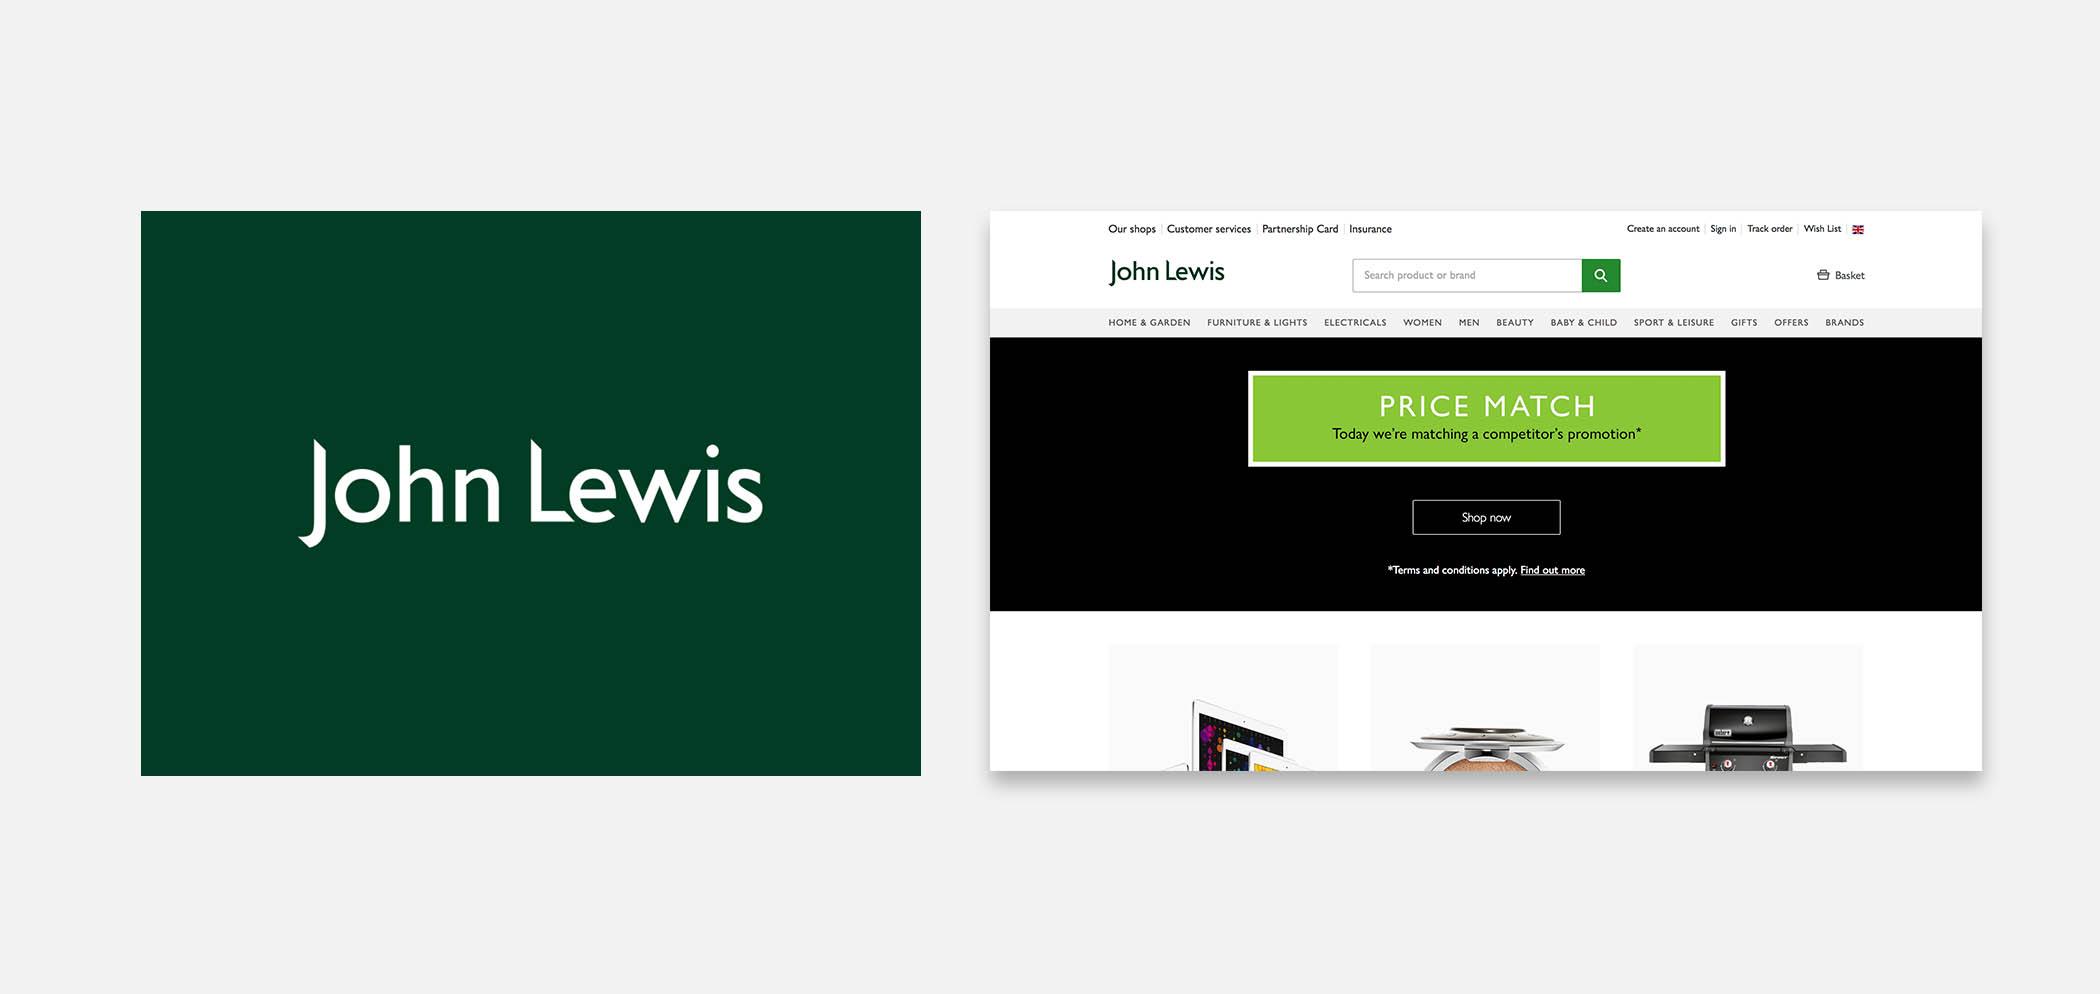 The John Lewis logo ina custom drawn version of Gill Sans.